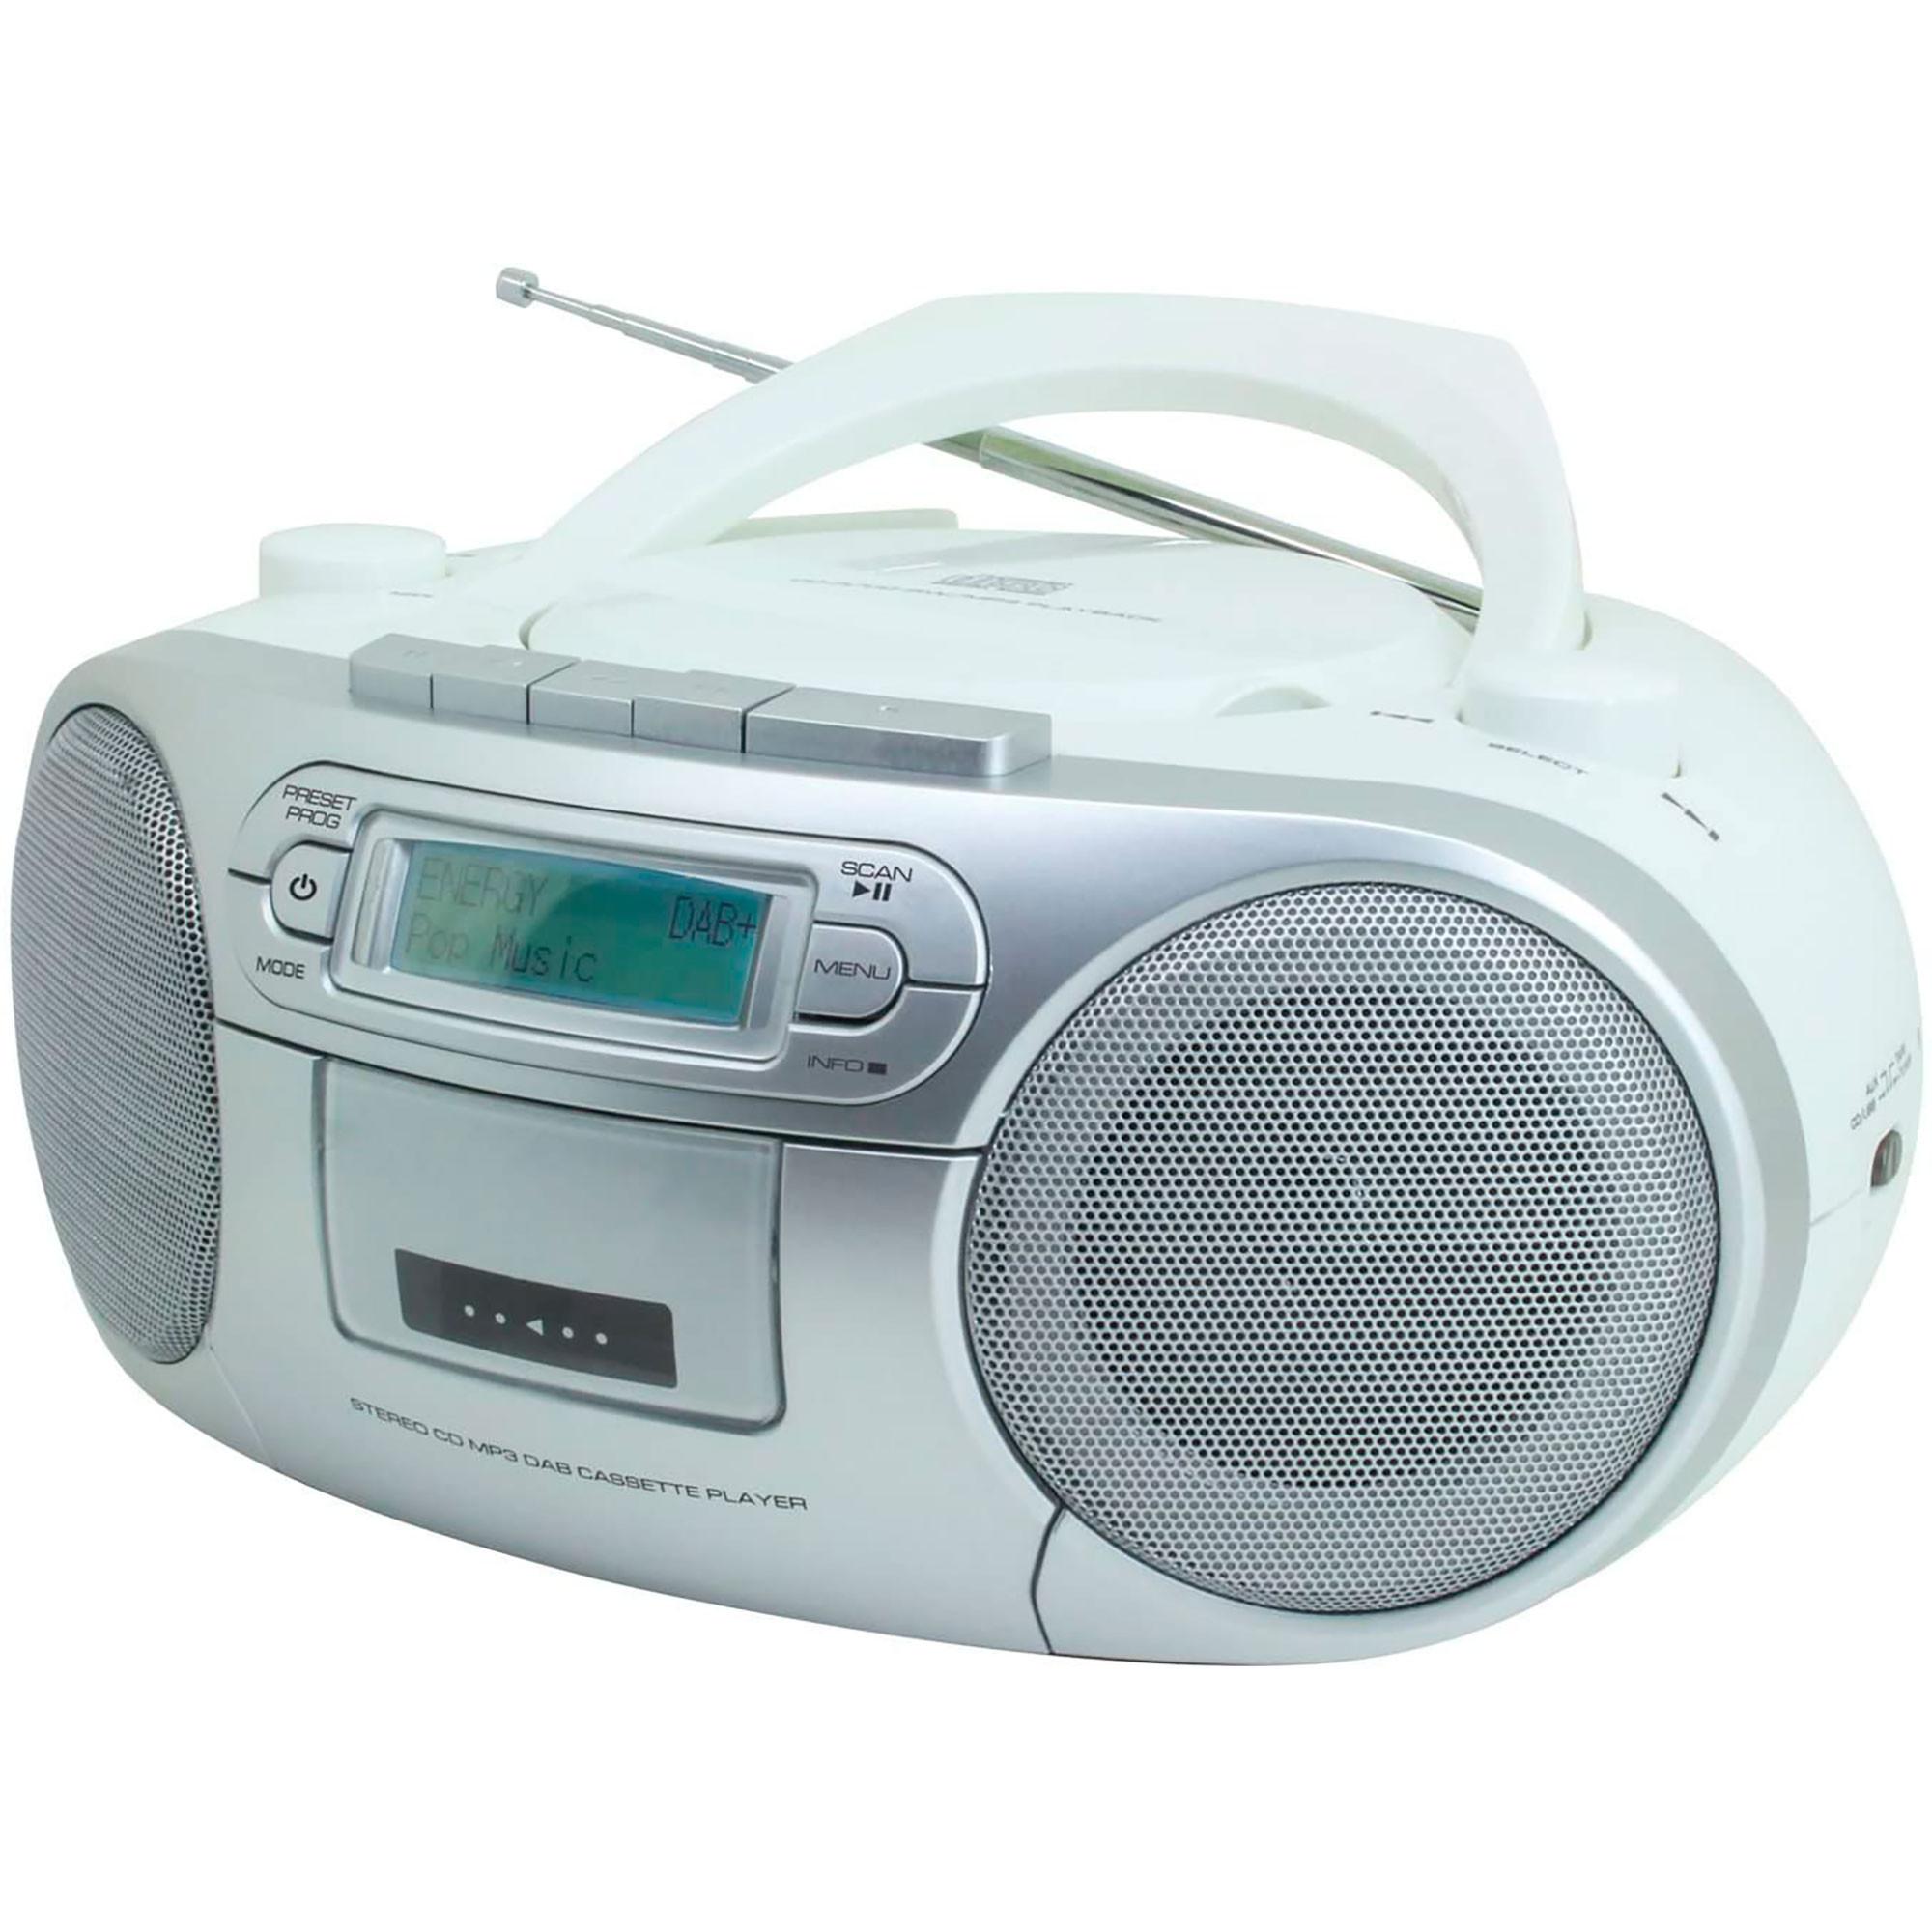 Soundmaster SCD7900WE Radio DAB+/FM, Reproductor de CD, CDR, CDRW y CD-MP3, USB, Cassette,Portátil, Pantalla LCD, PMPO 60W, Blanco